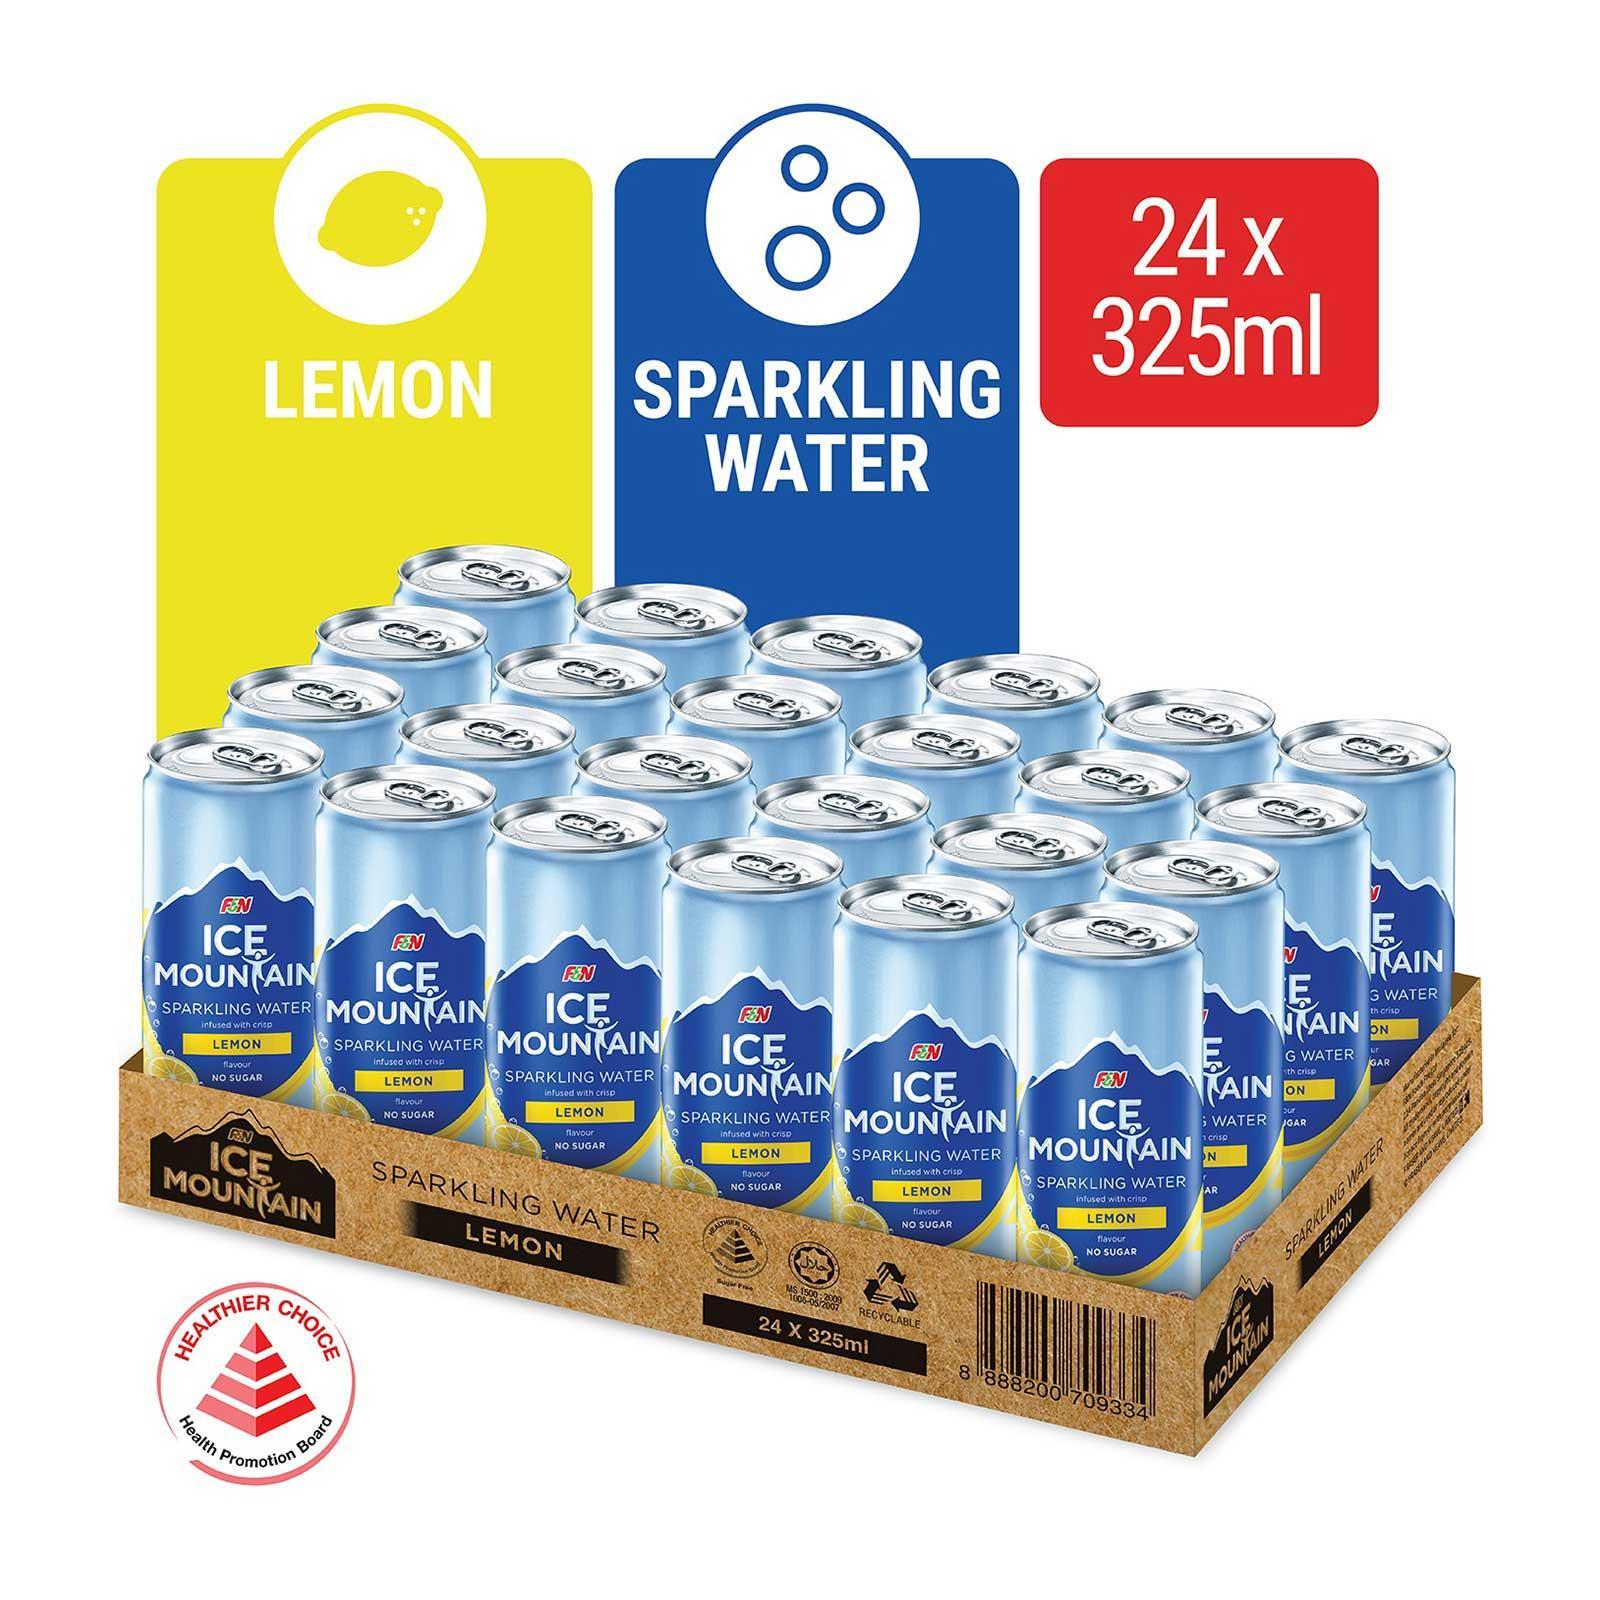 Ice Mountain Lemon Sparkling Water 24s Case